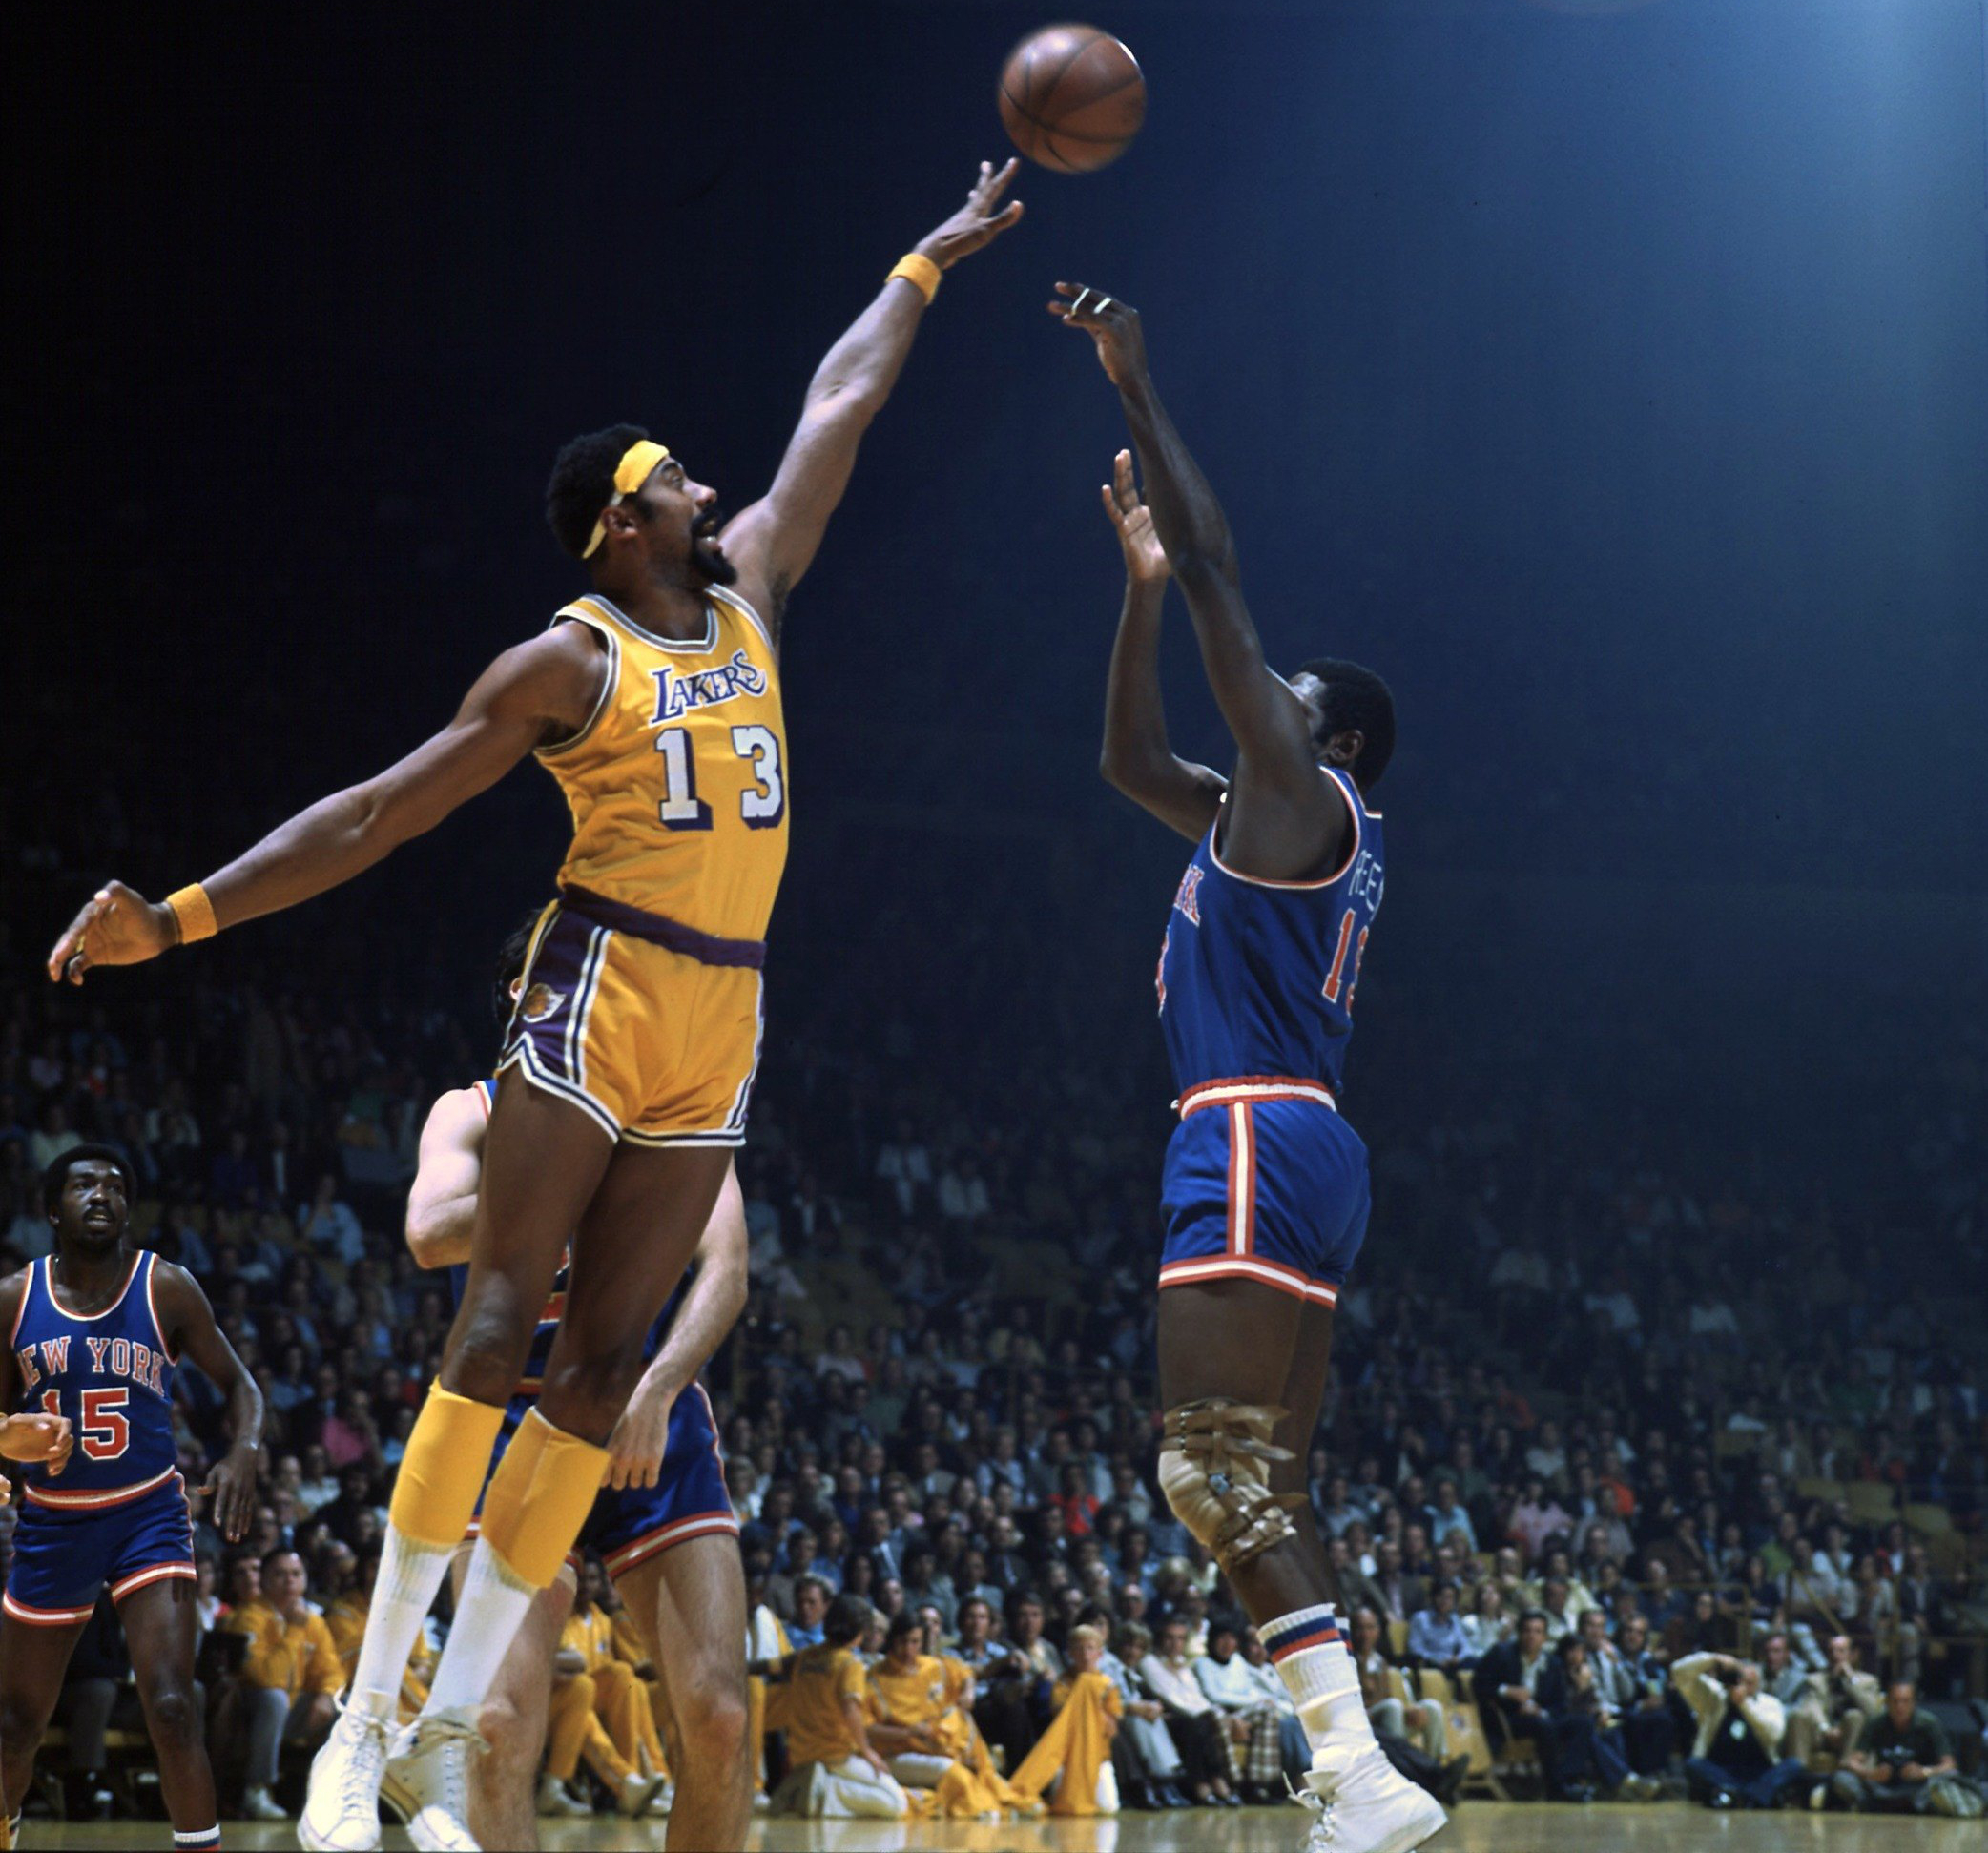 Nba Basketball New York Knicks: NBA: Ranking The Last 50 Champions